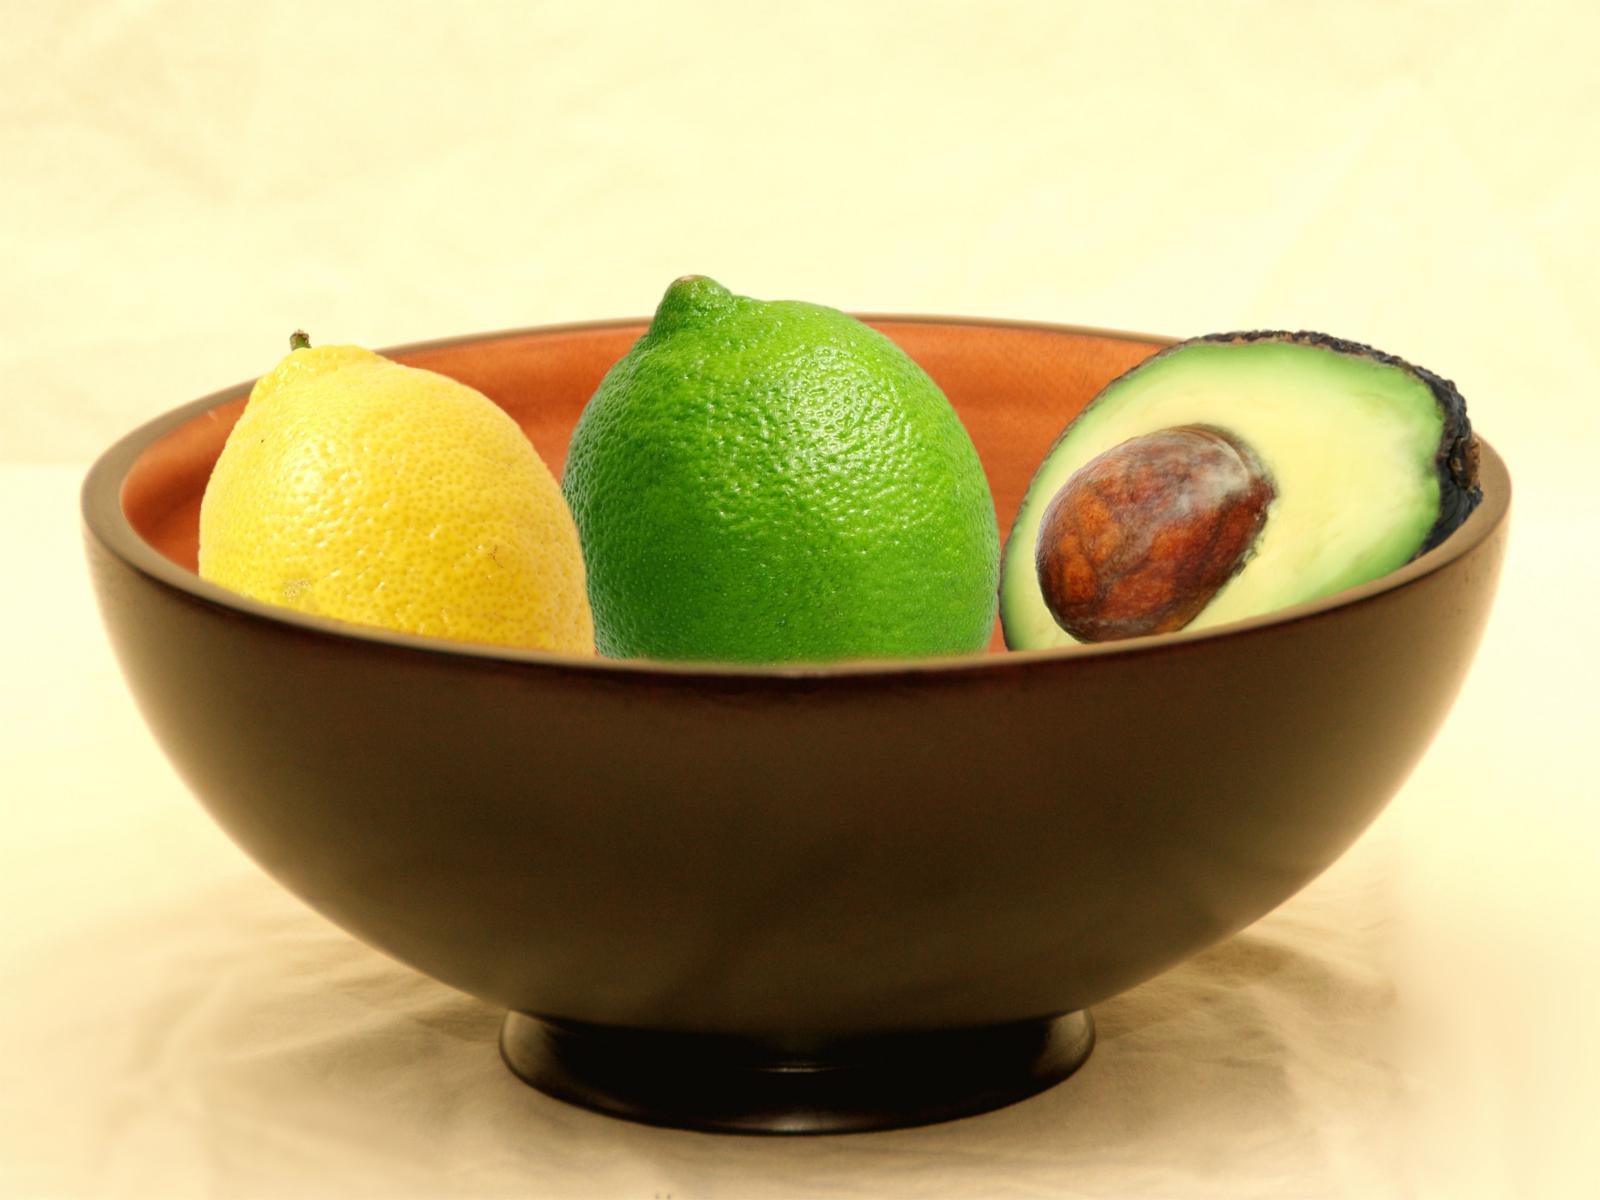 Simple Bowl Of Fruit | www.imgkid.com - The Image Kid Has It!